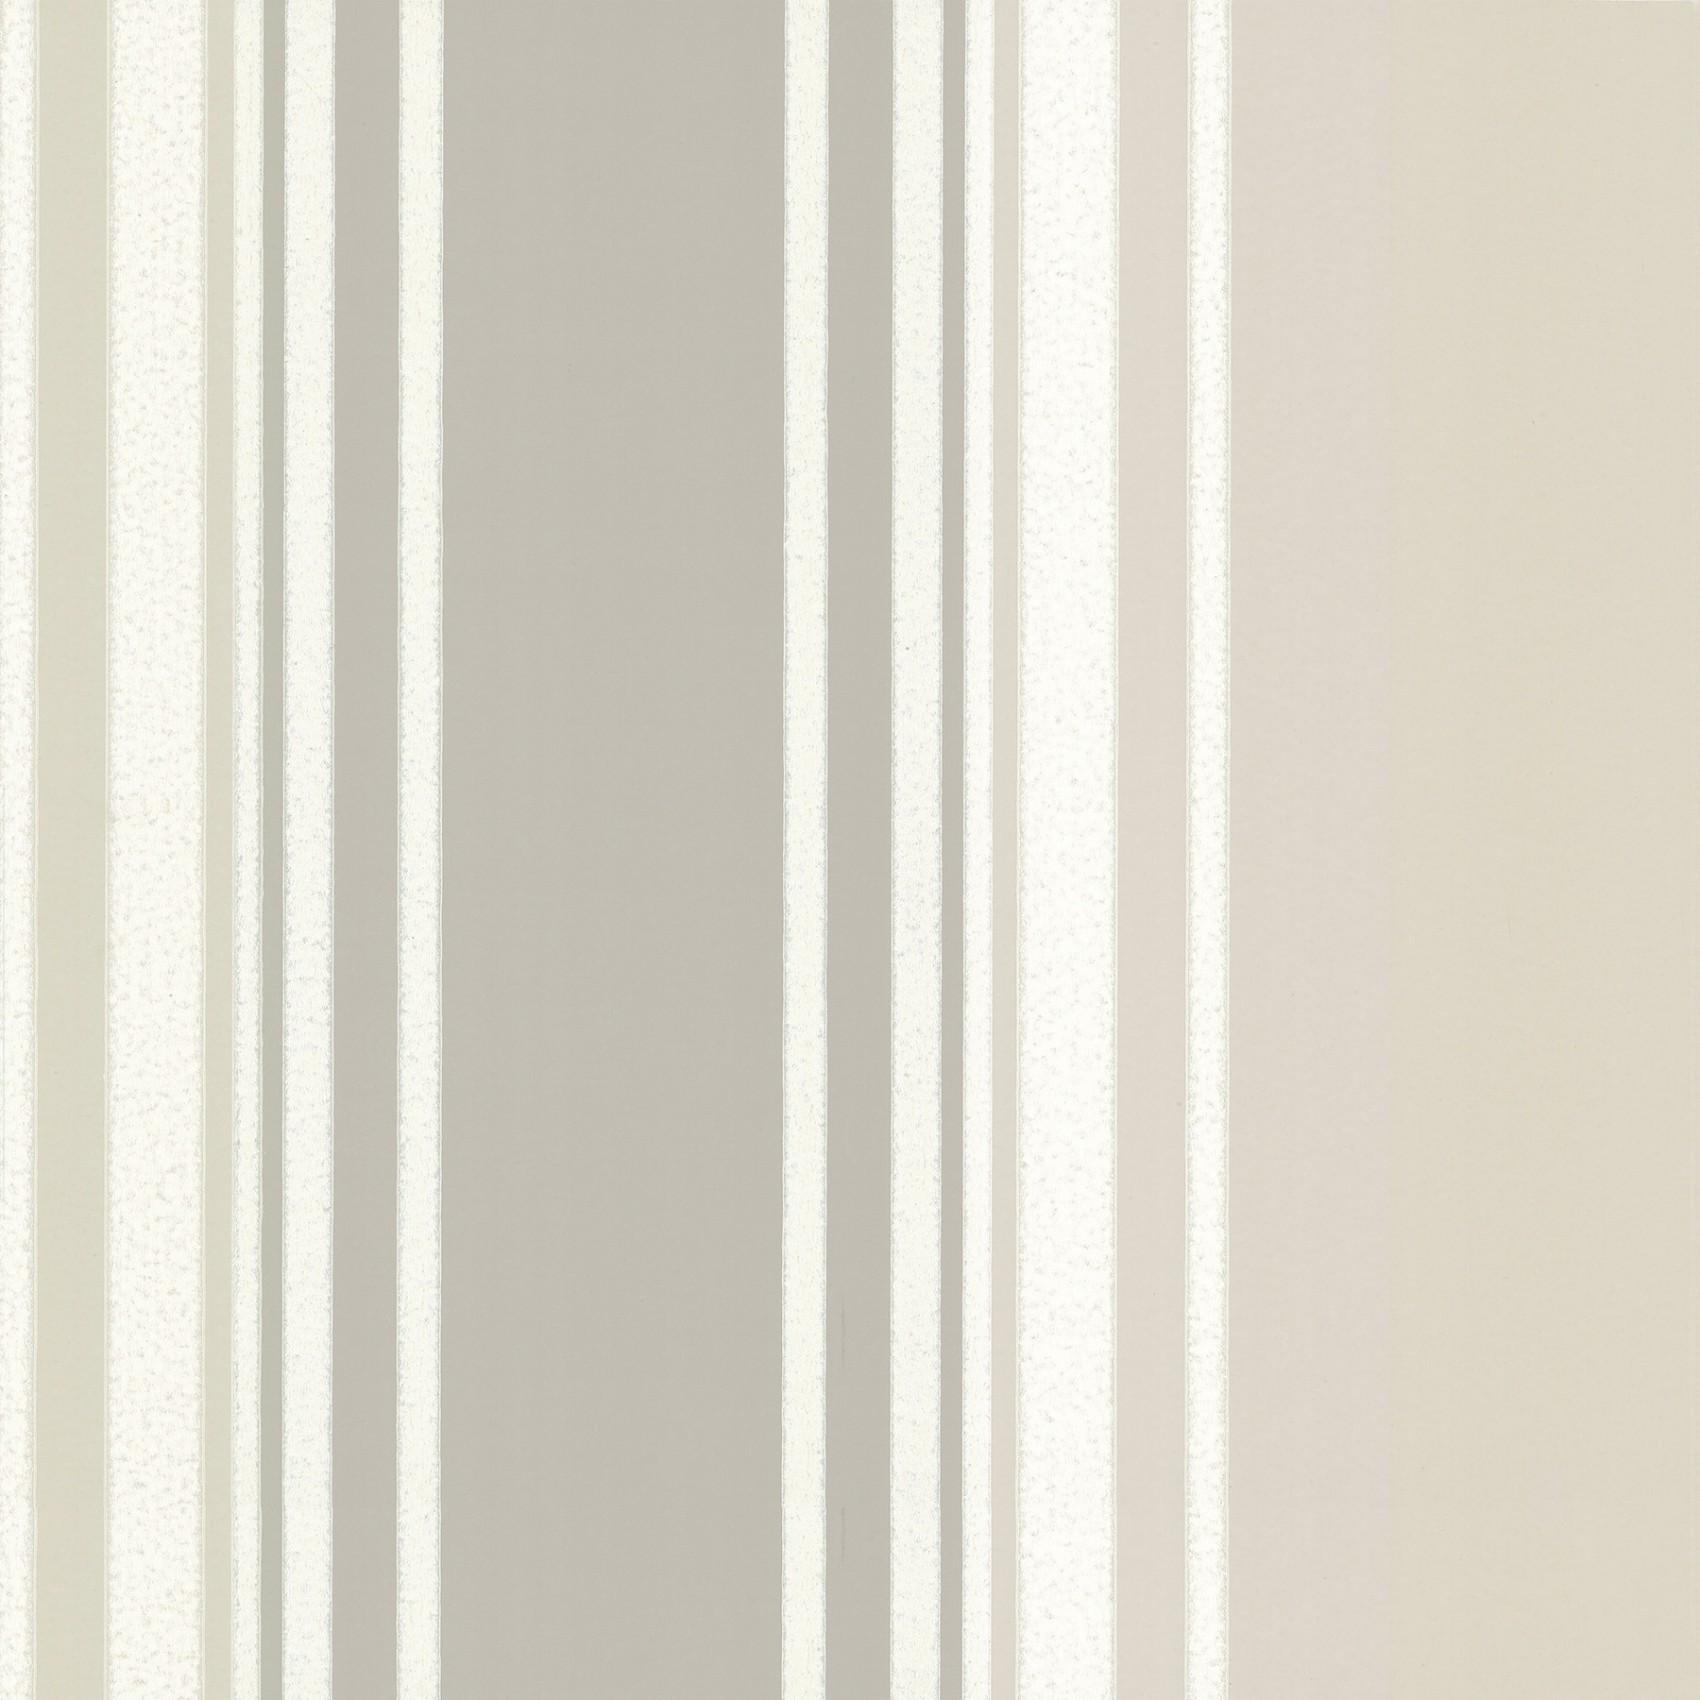 Английские обои Little Greene,  коллекция Painted Papers, артикул0286TSSCAND